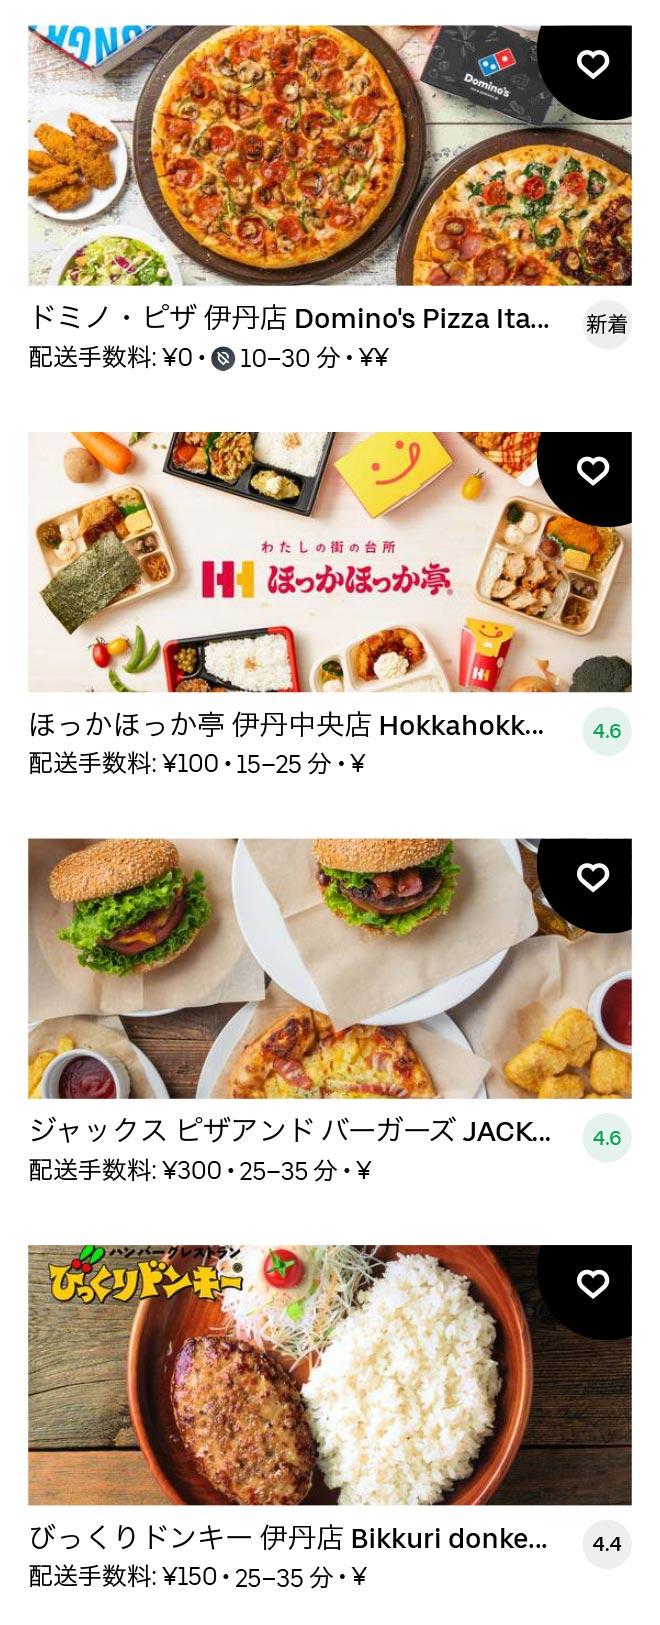 Hankyu itami menu 2011 04